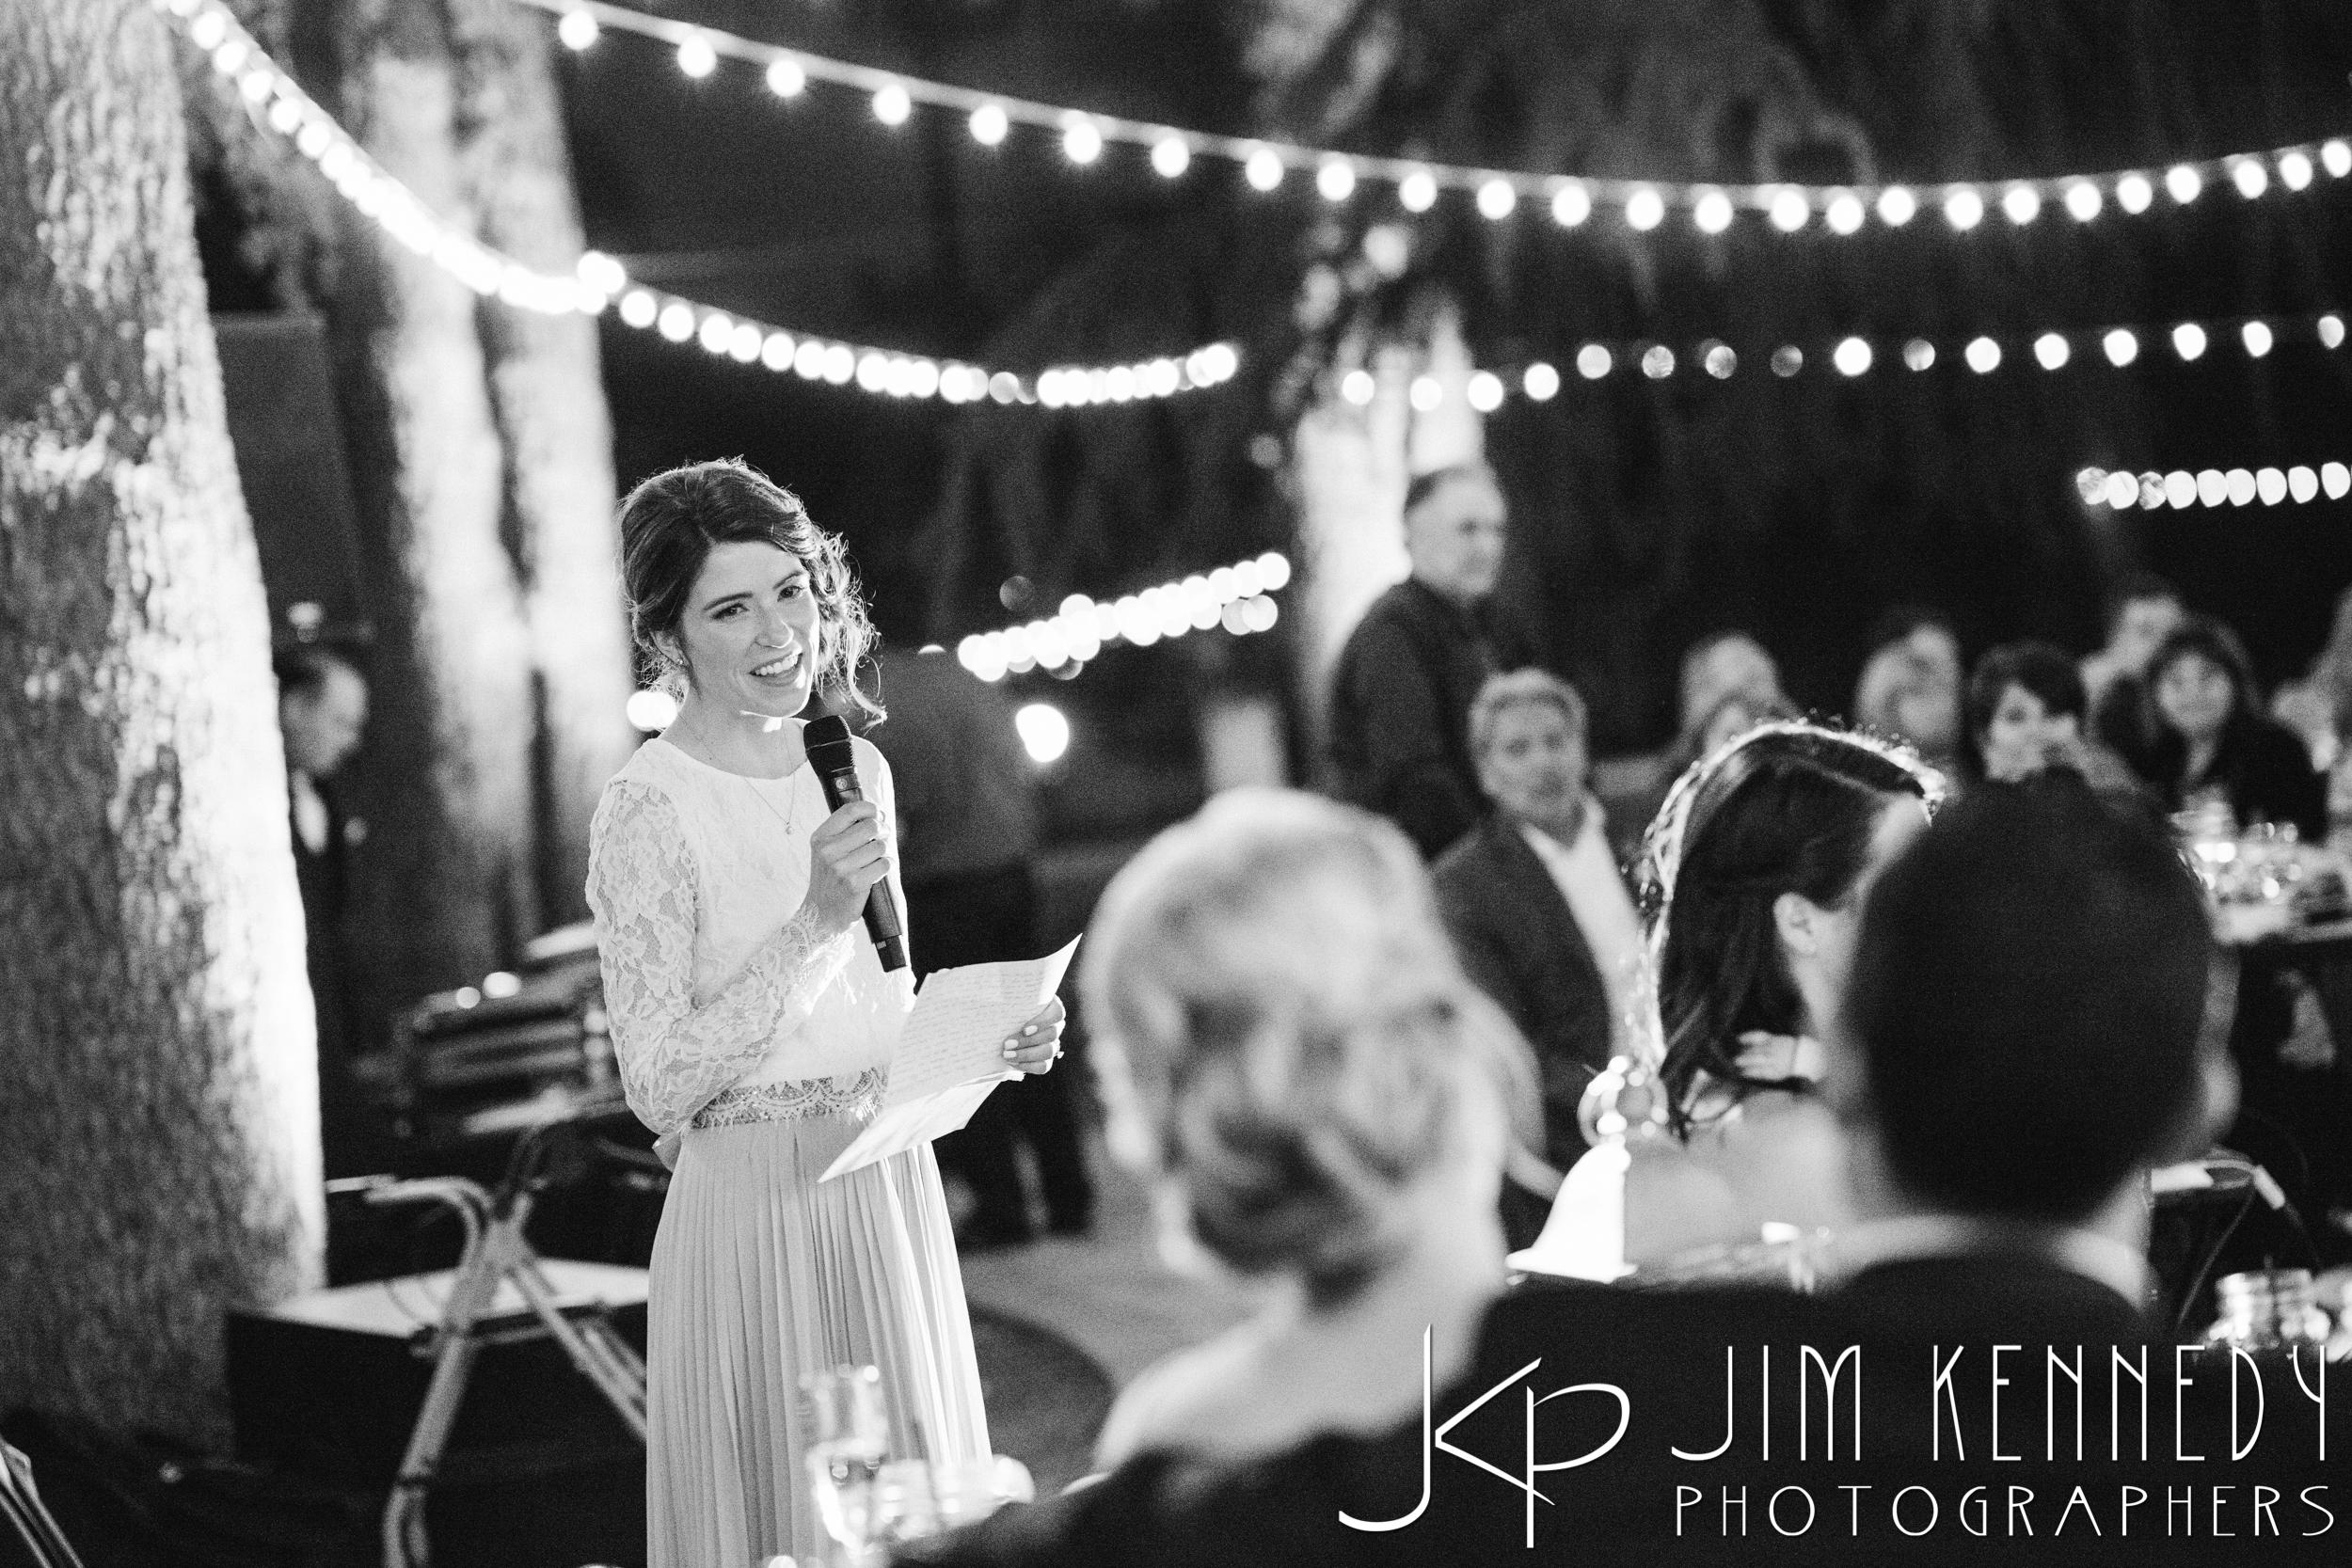 jim_kennedy_photographers_highland_springs_wedding_caitlyn_0195.jpg